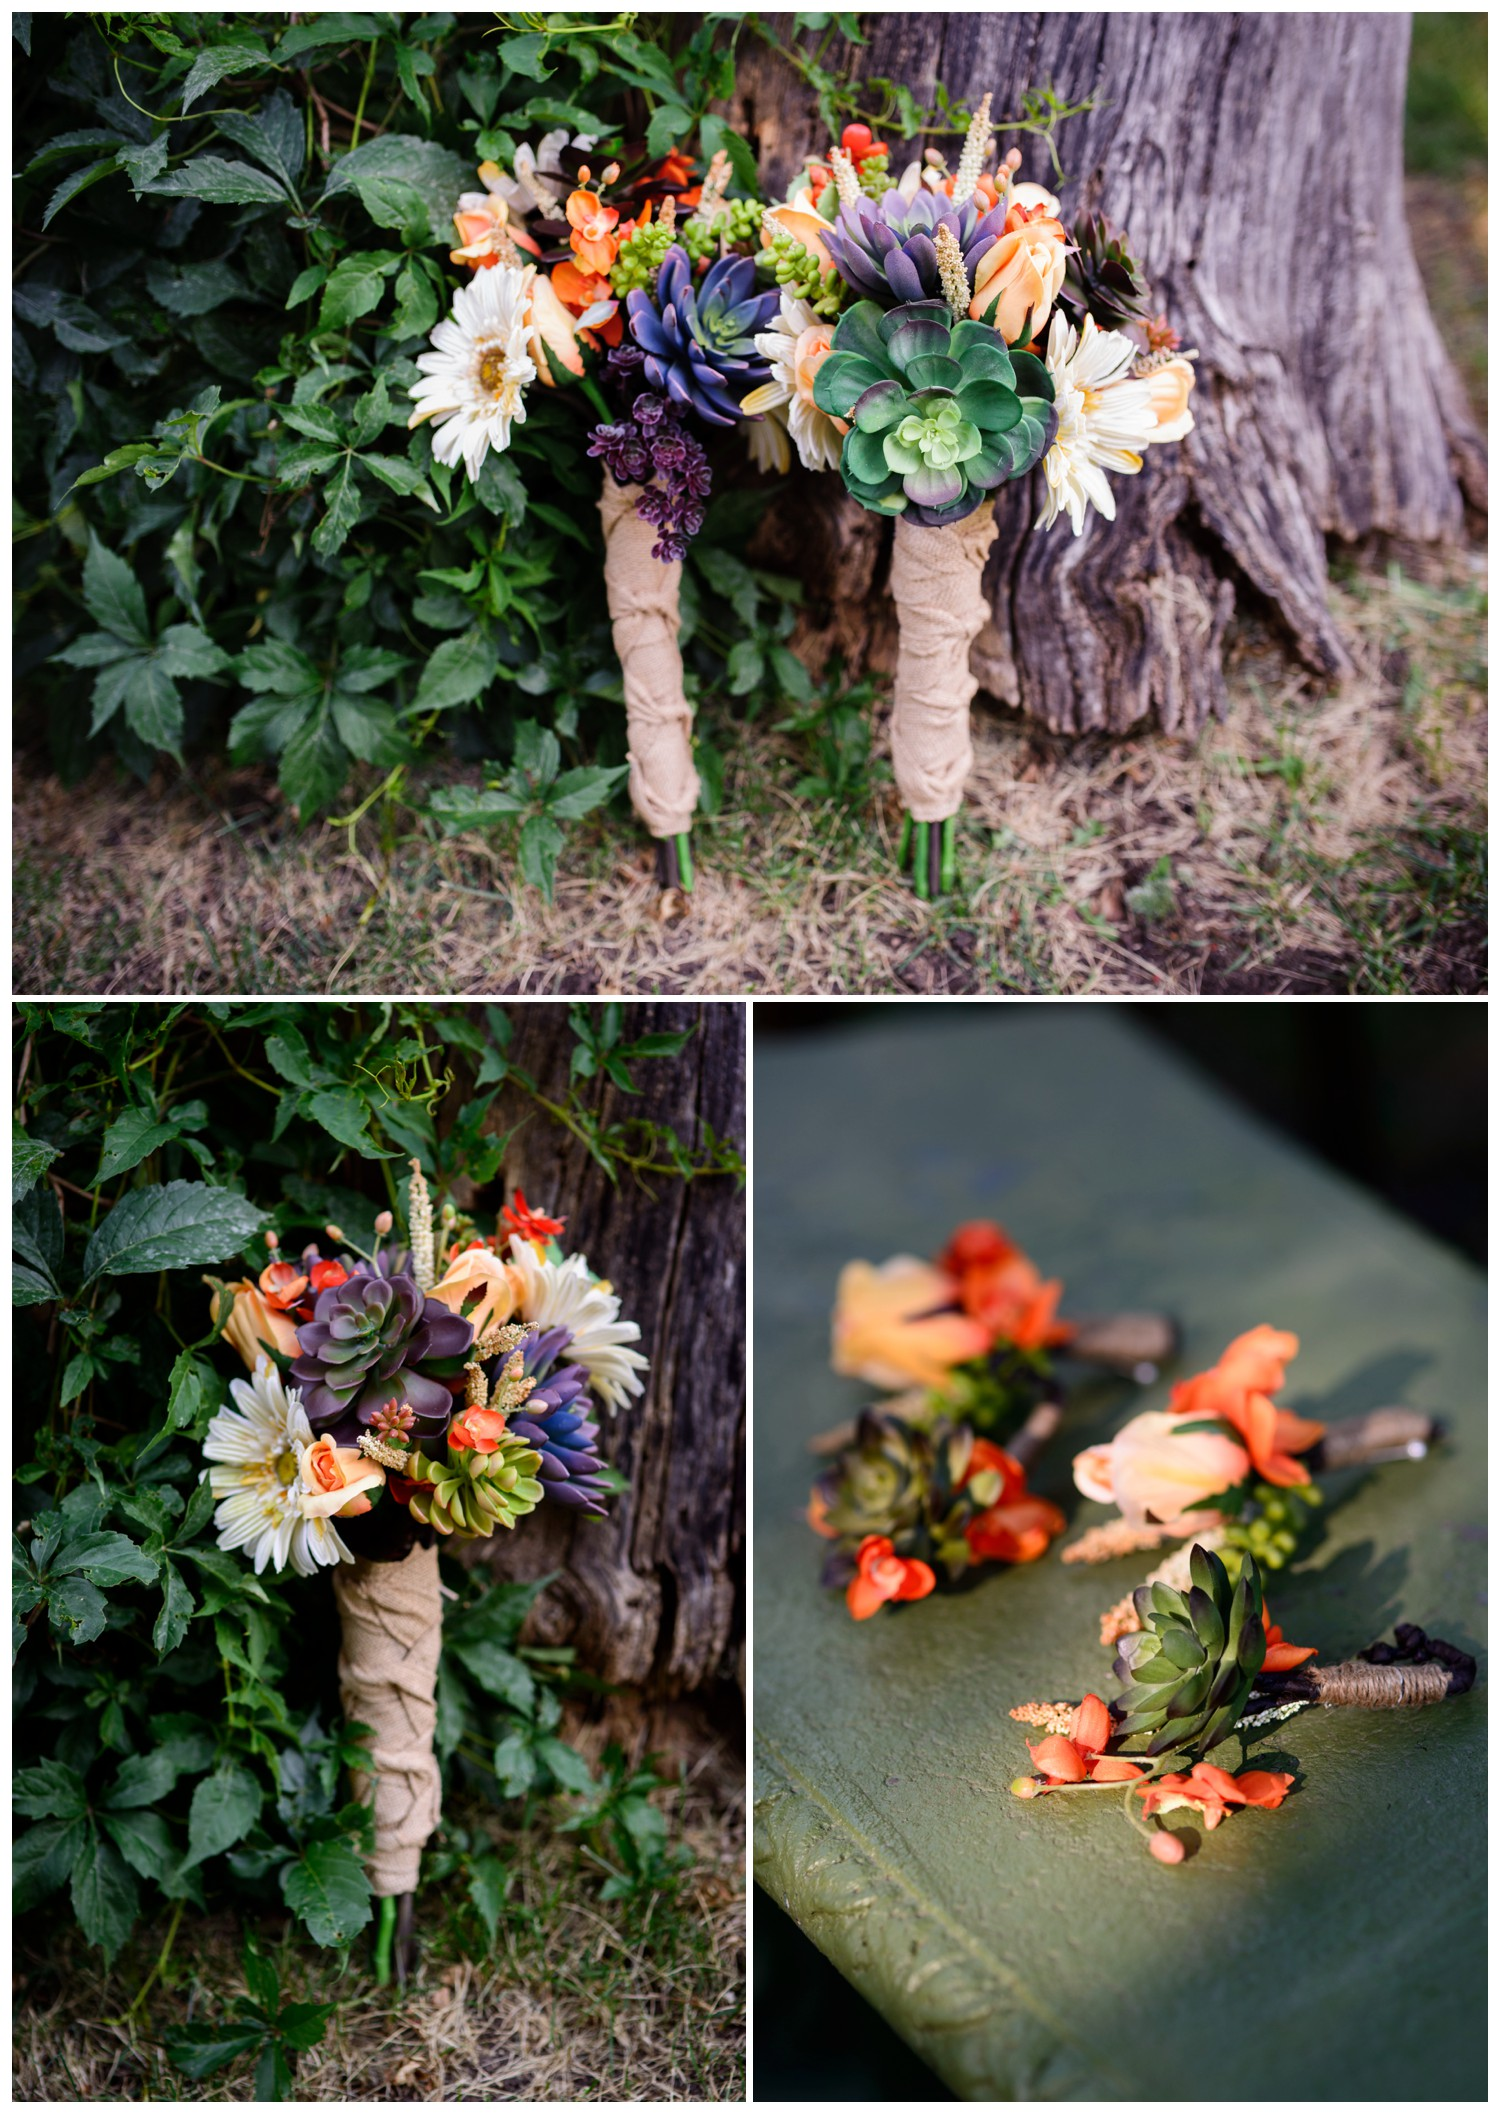 Morningside-manor-colorado-outdoor-wedding-photography_0011.jpg